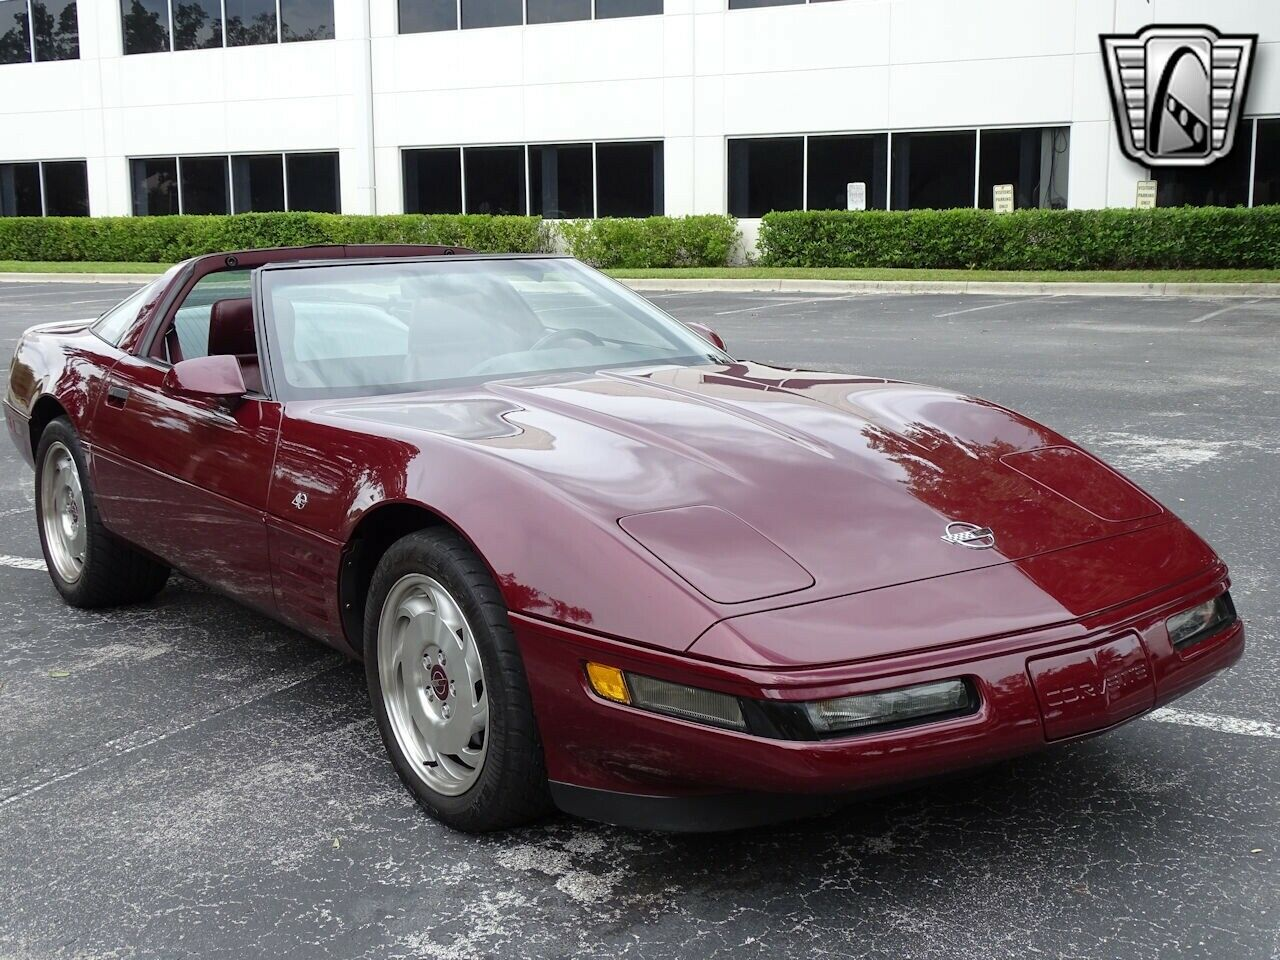 1993 Red Chevrolet Corvette     C4 Corvette Photo 10